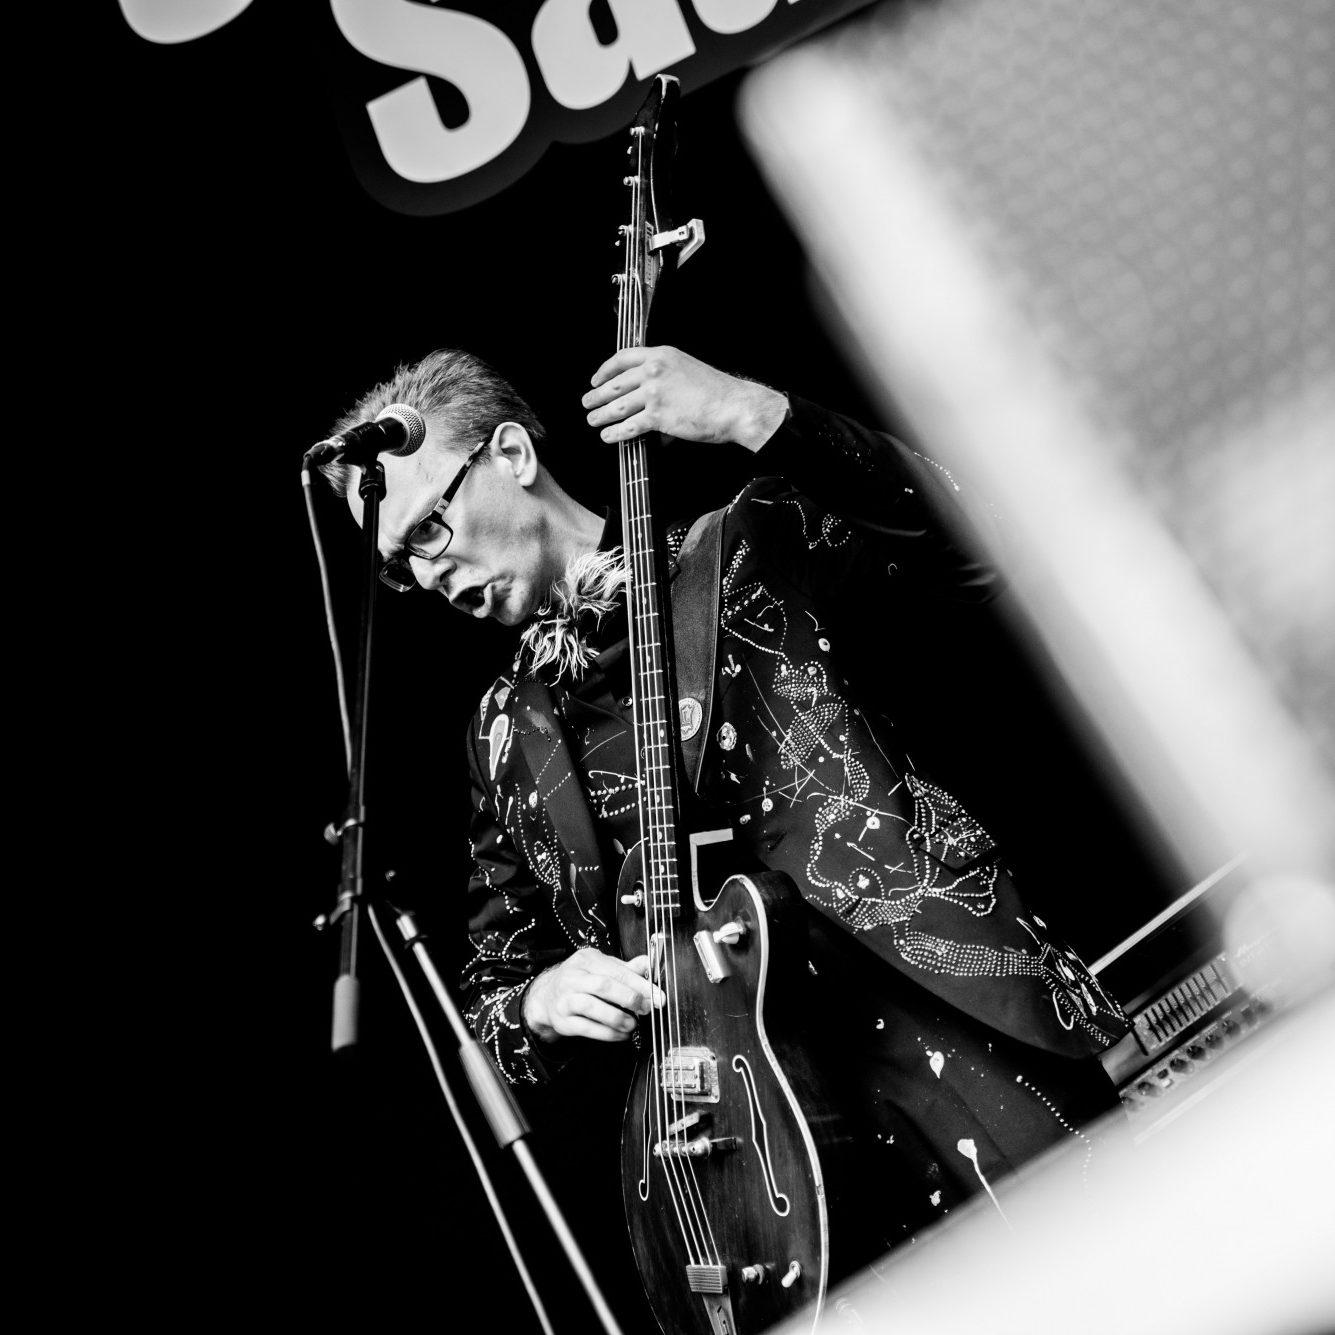 Meow + Jim Black (US/Berlin)